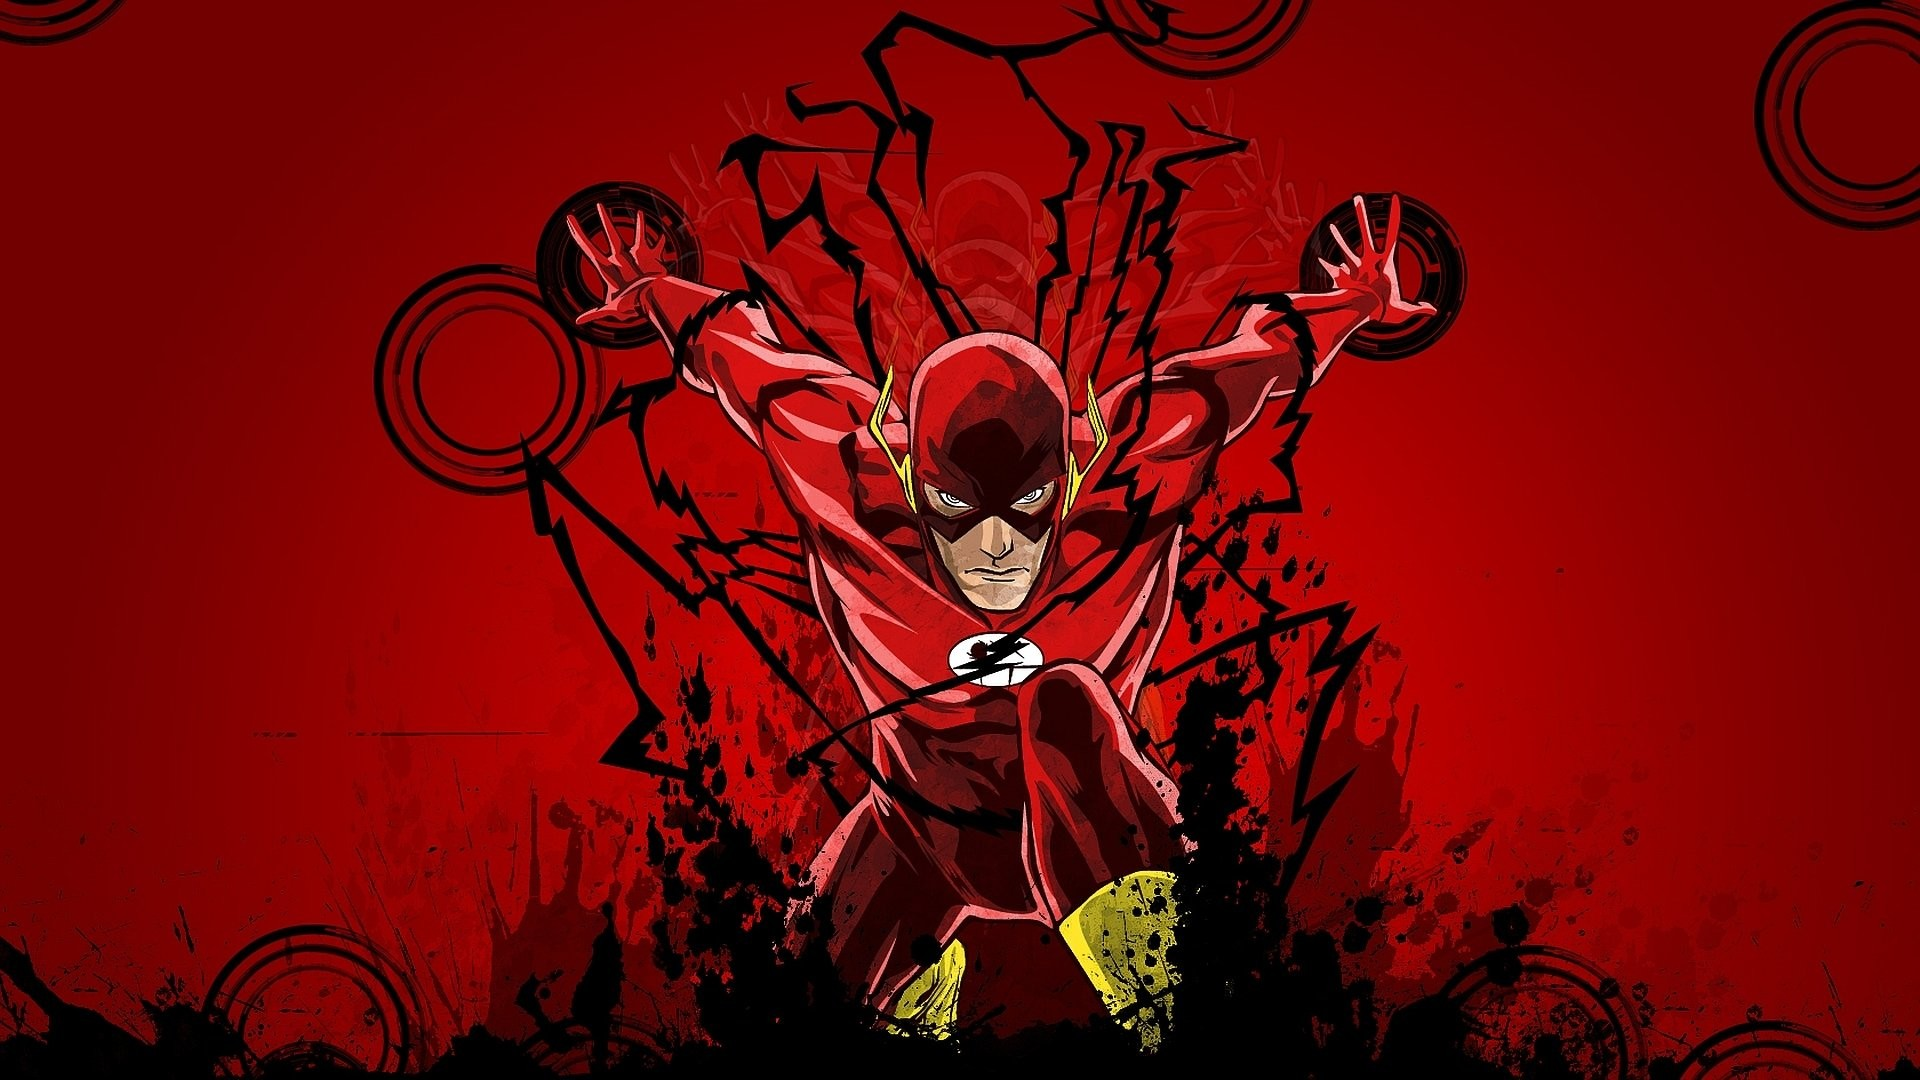 flash superhero wallpaper (66+ images)